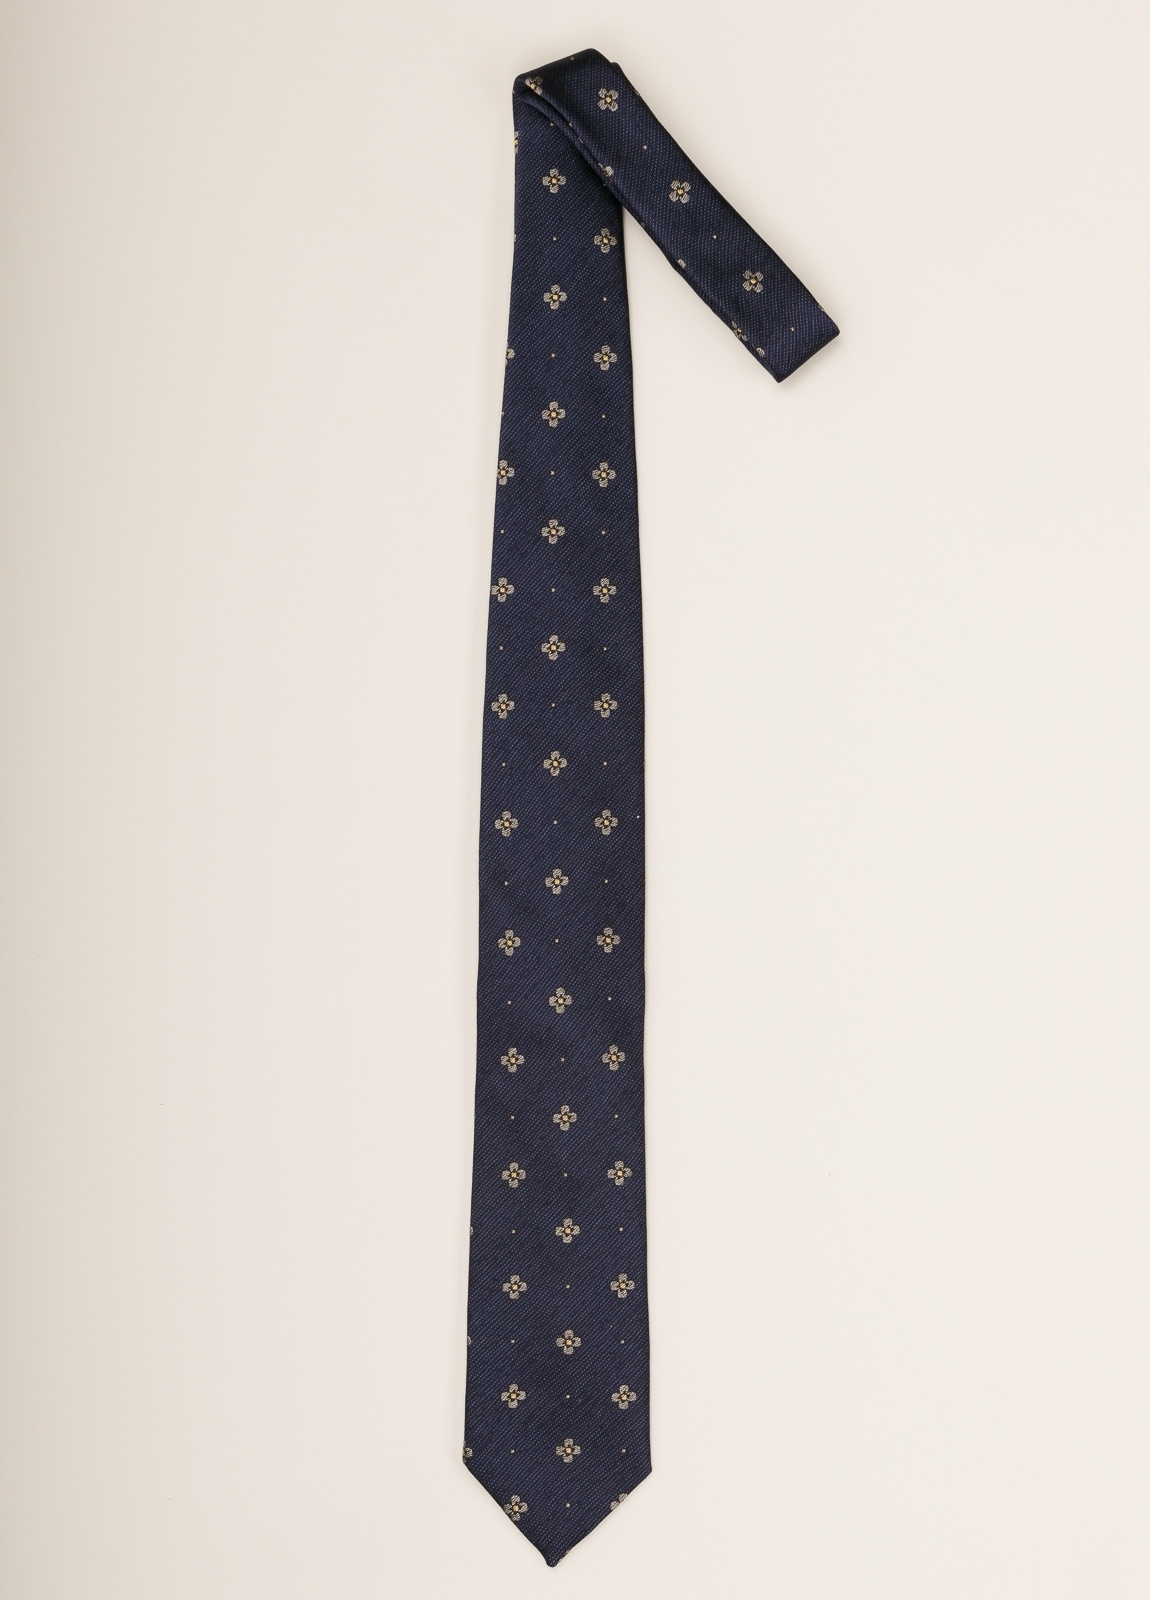 Corbata FUREST COLECCIÓN azul - Ítem1